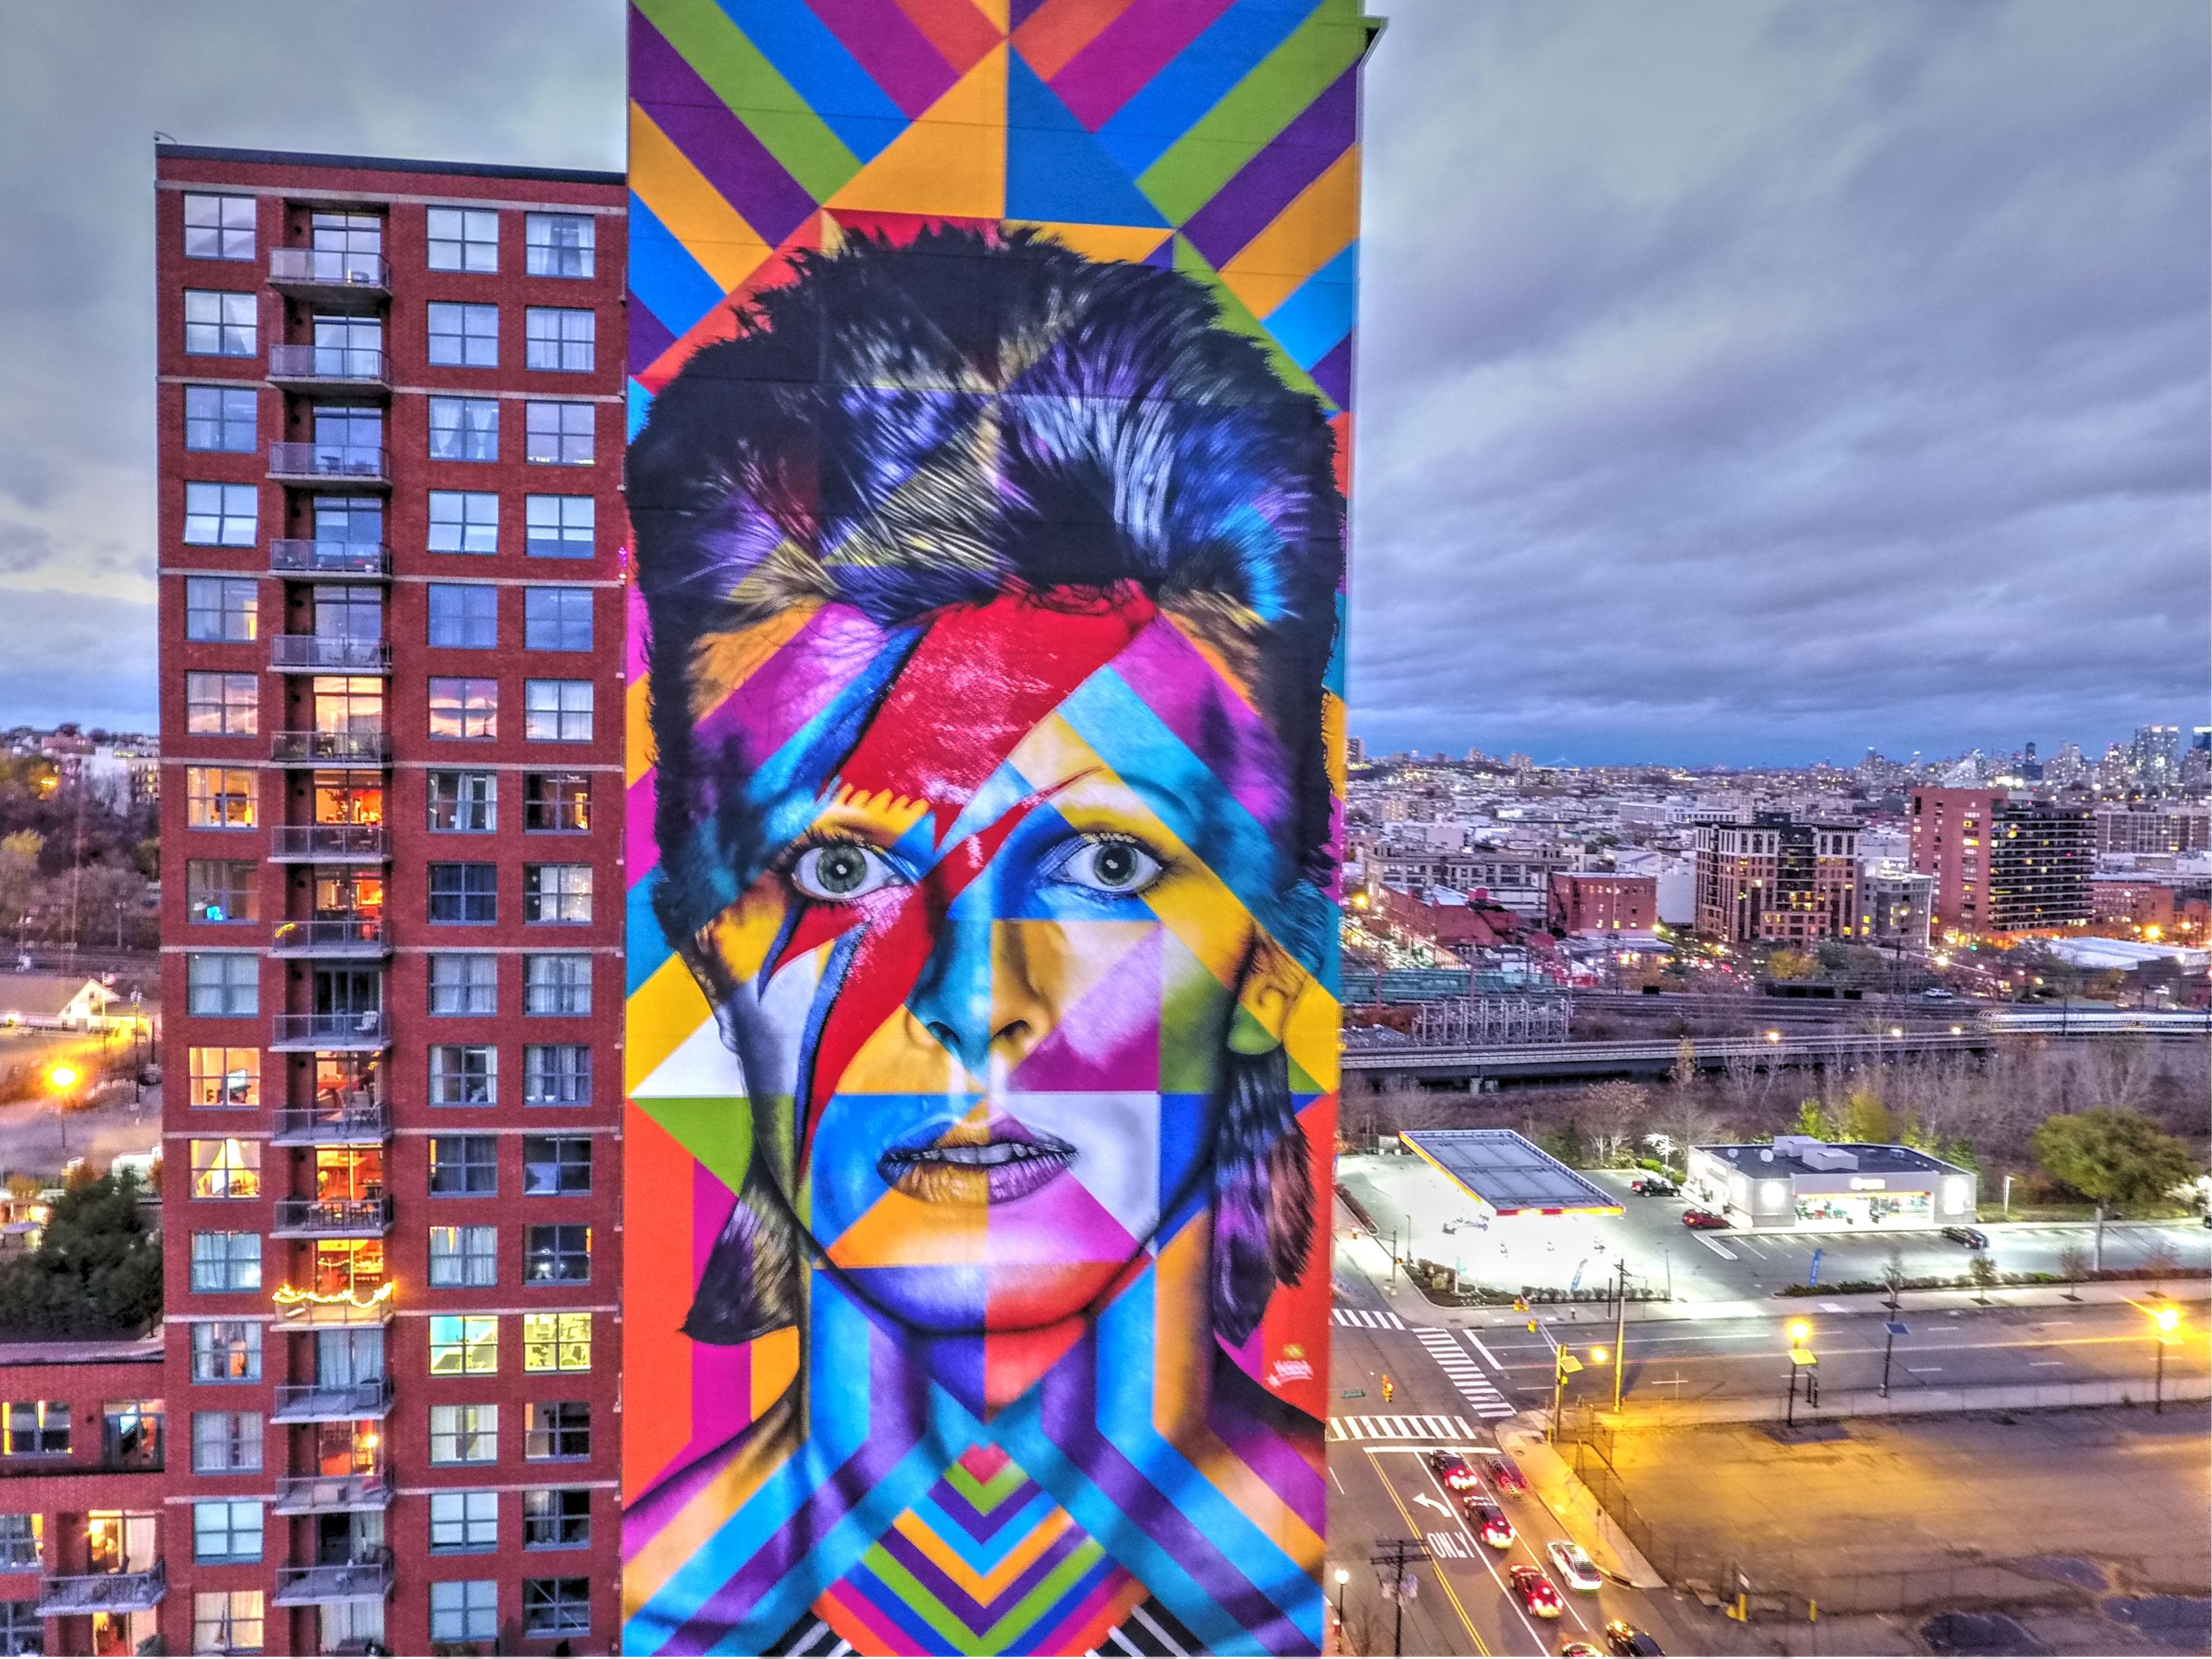 Graffiti art jersey city - Eduardo Kobra 2016 Jersey City Usa